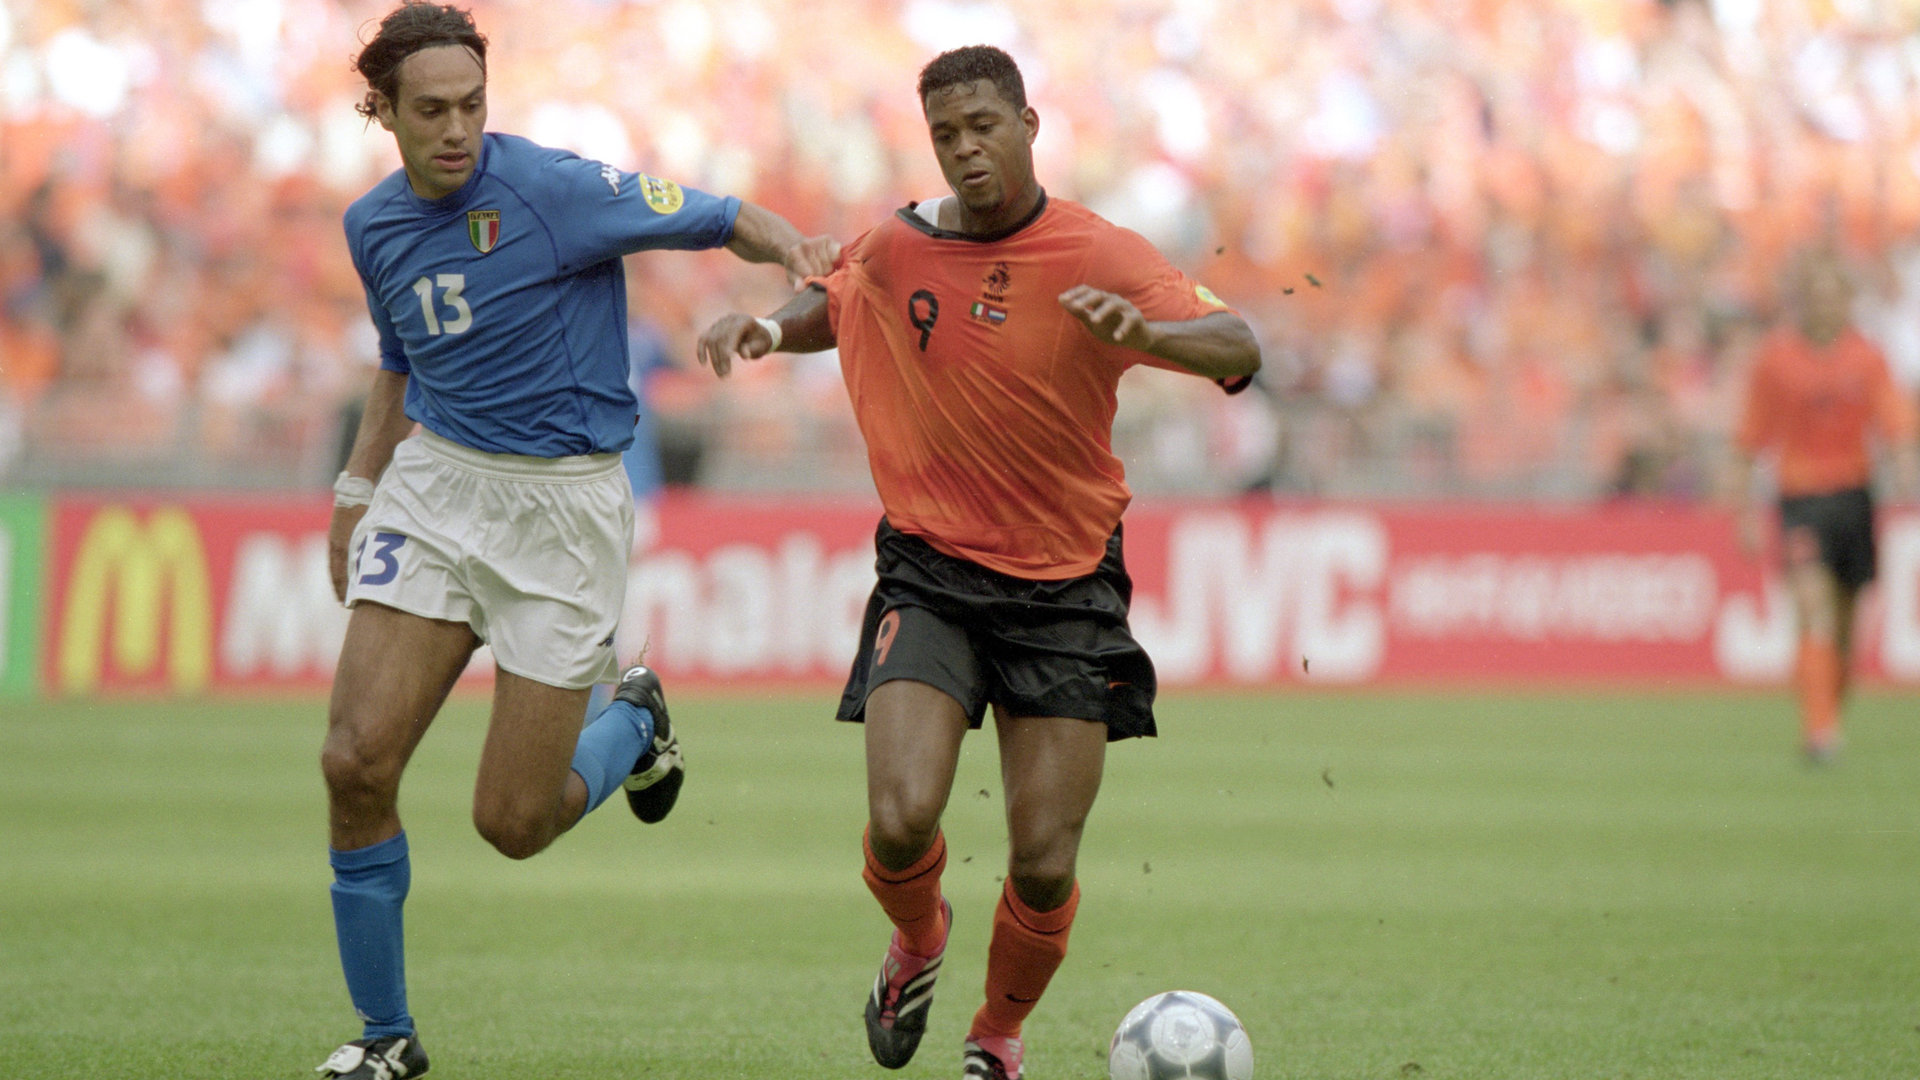 Nesta és Kluivert / Fotó: Goal.com